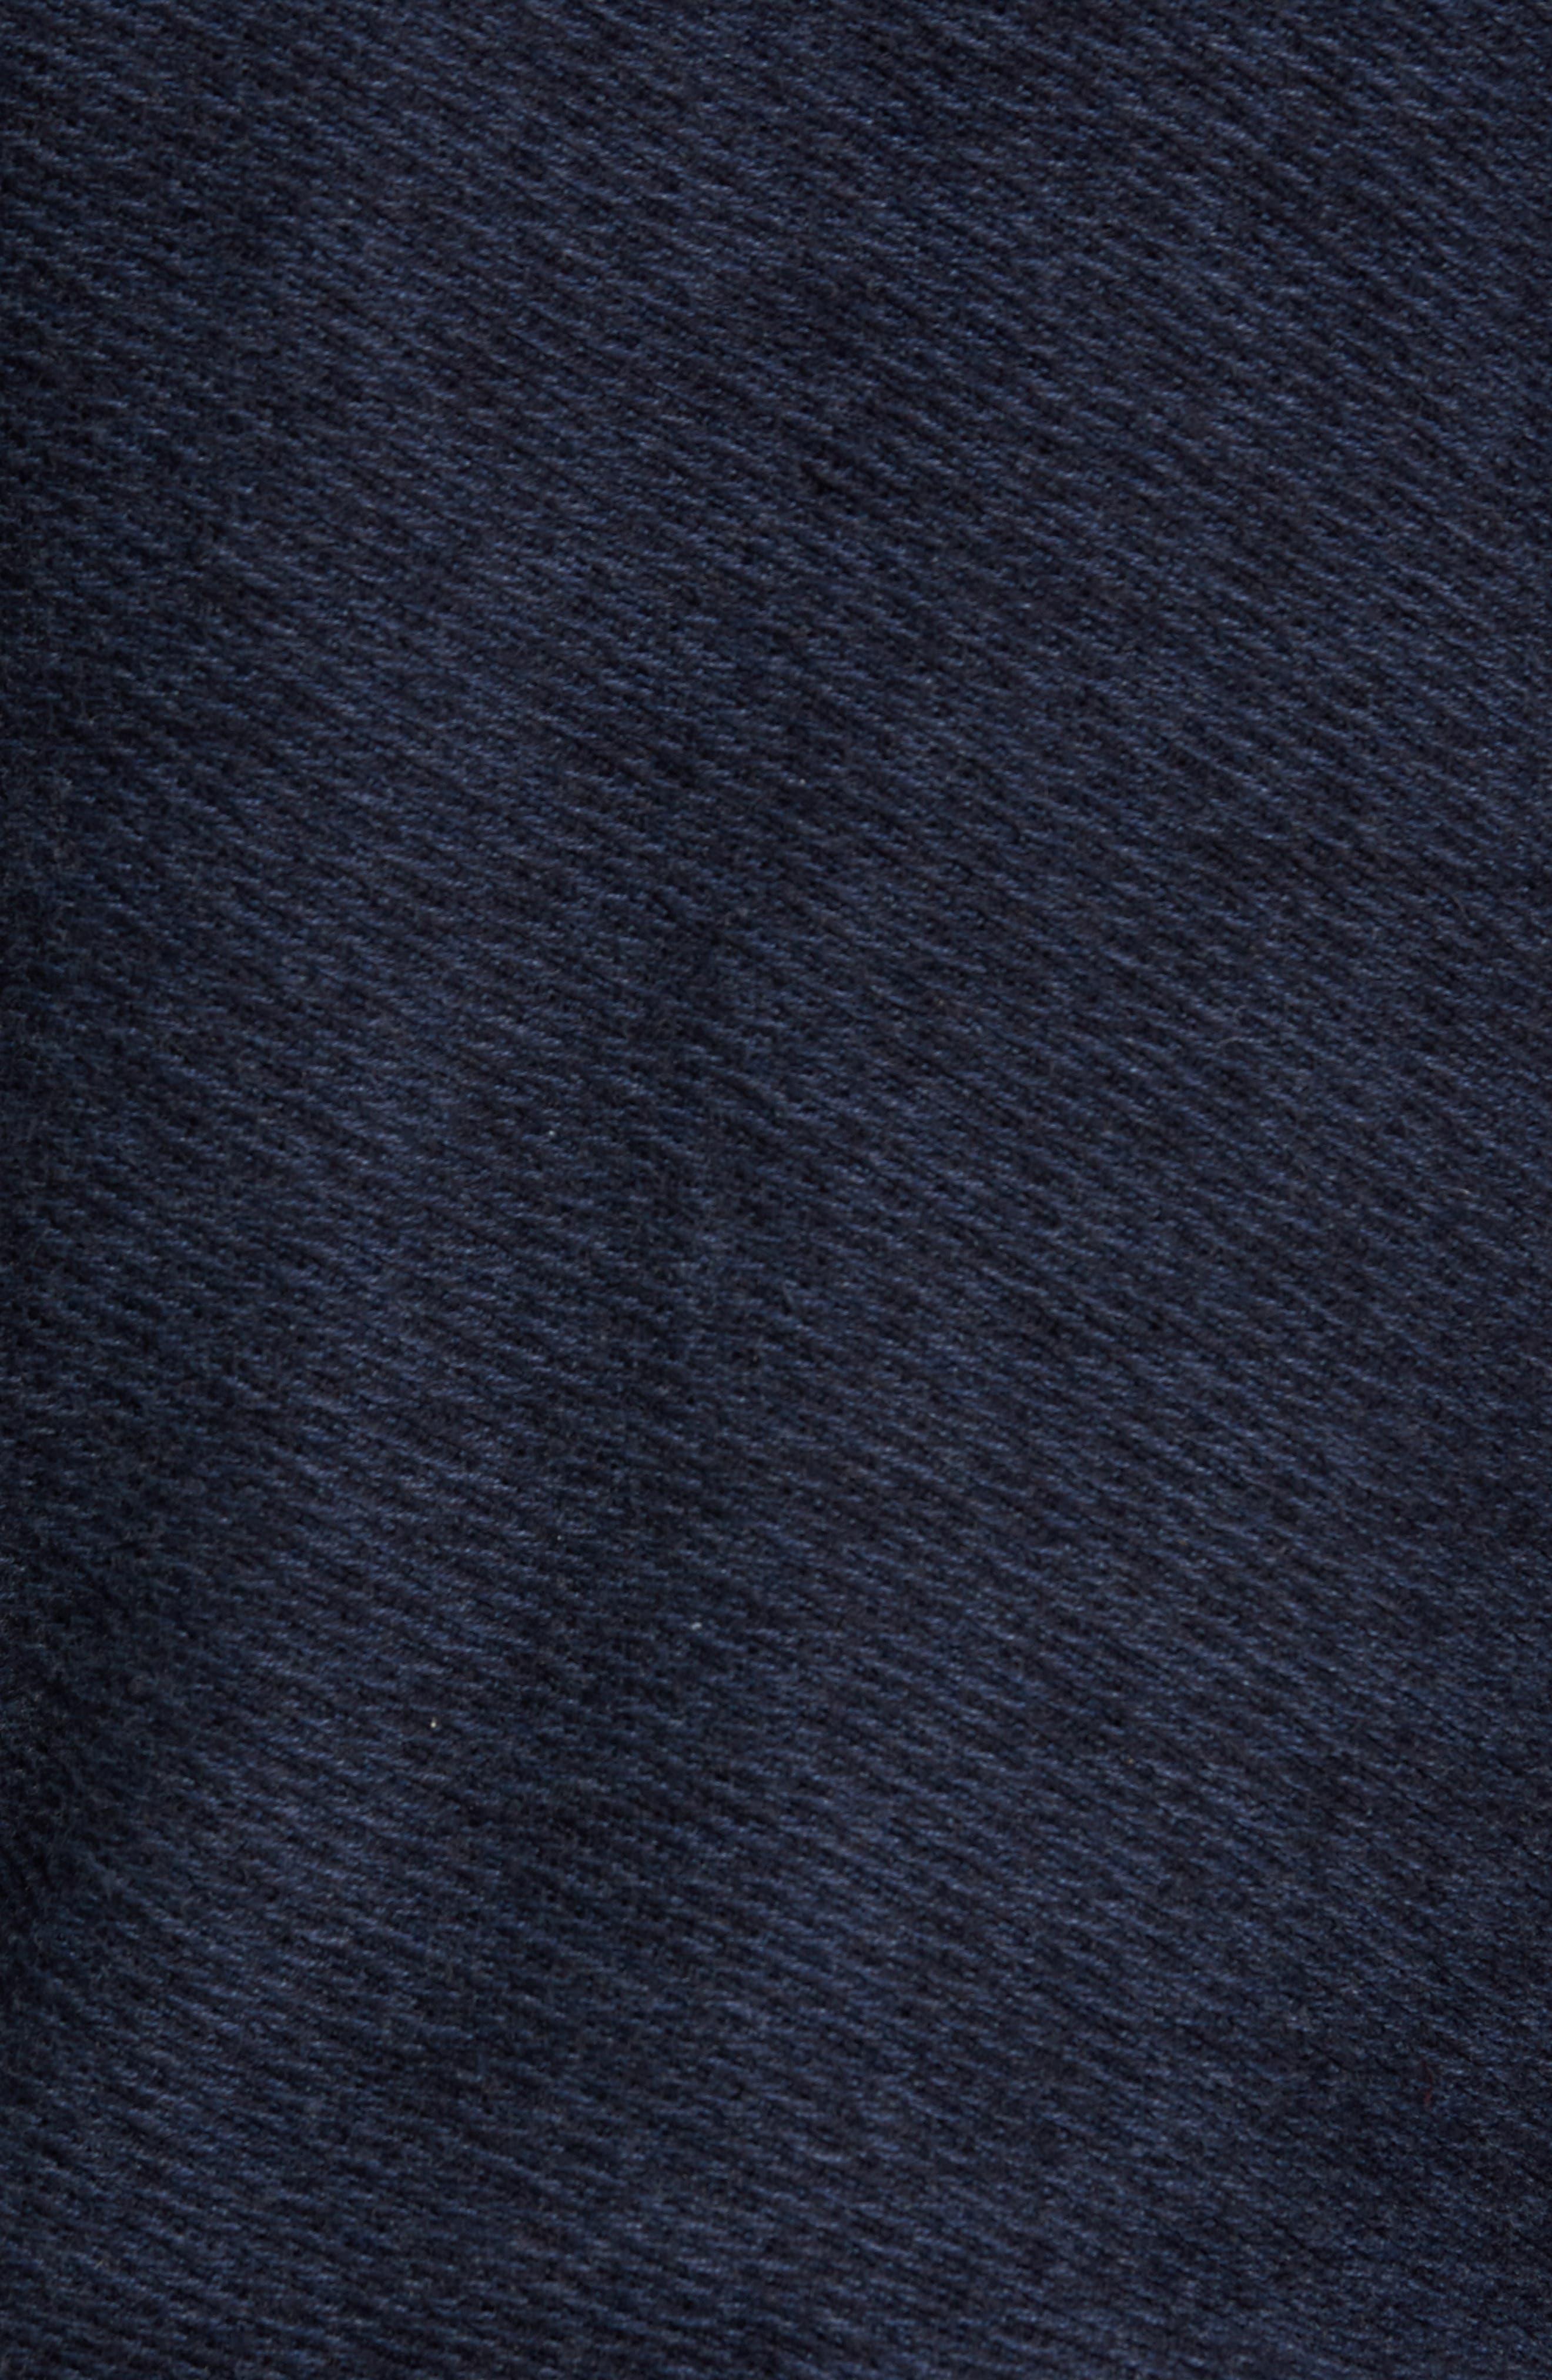 Cotton & Cashmere V-Neck Sweater,                             Alternate thumbnail 5, color,                             410